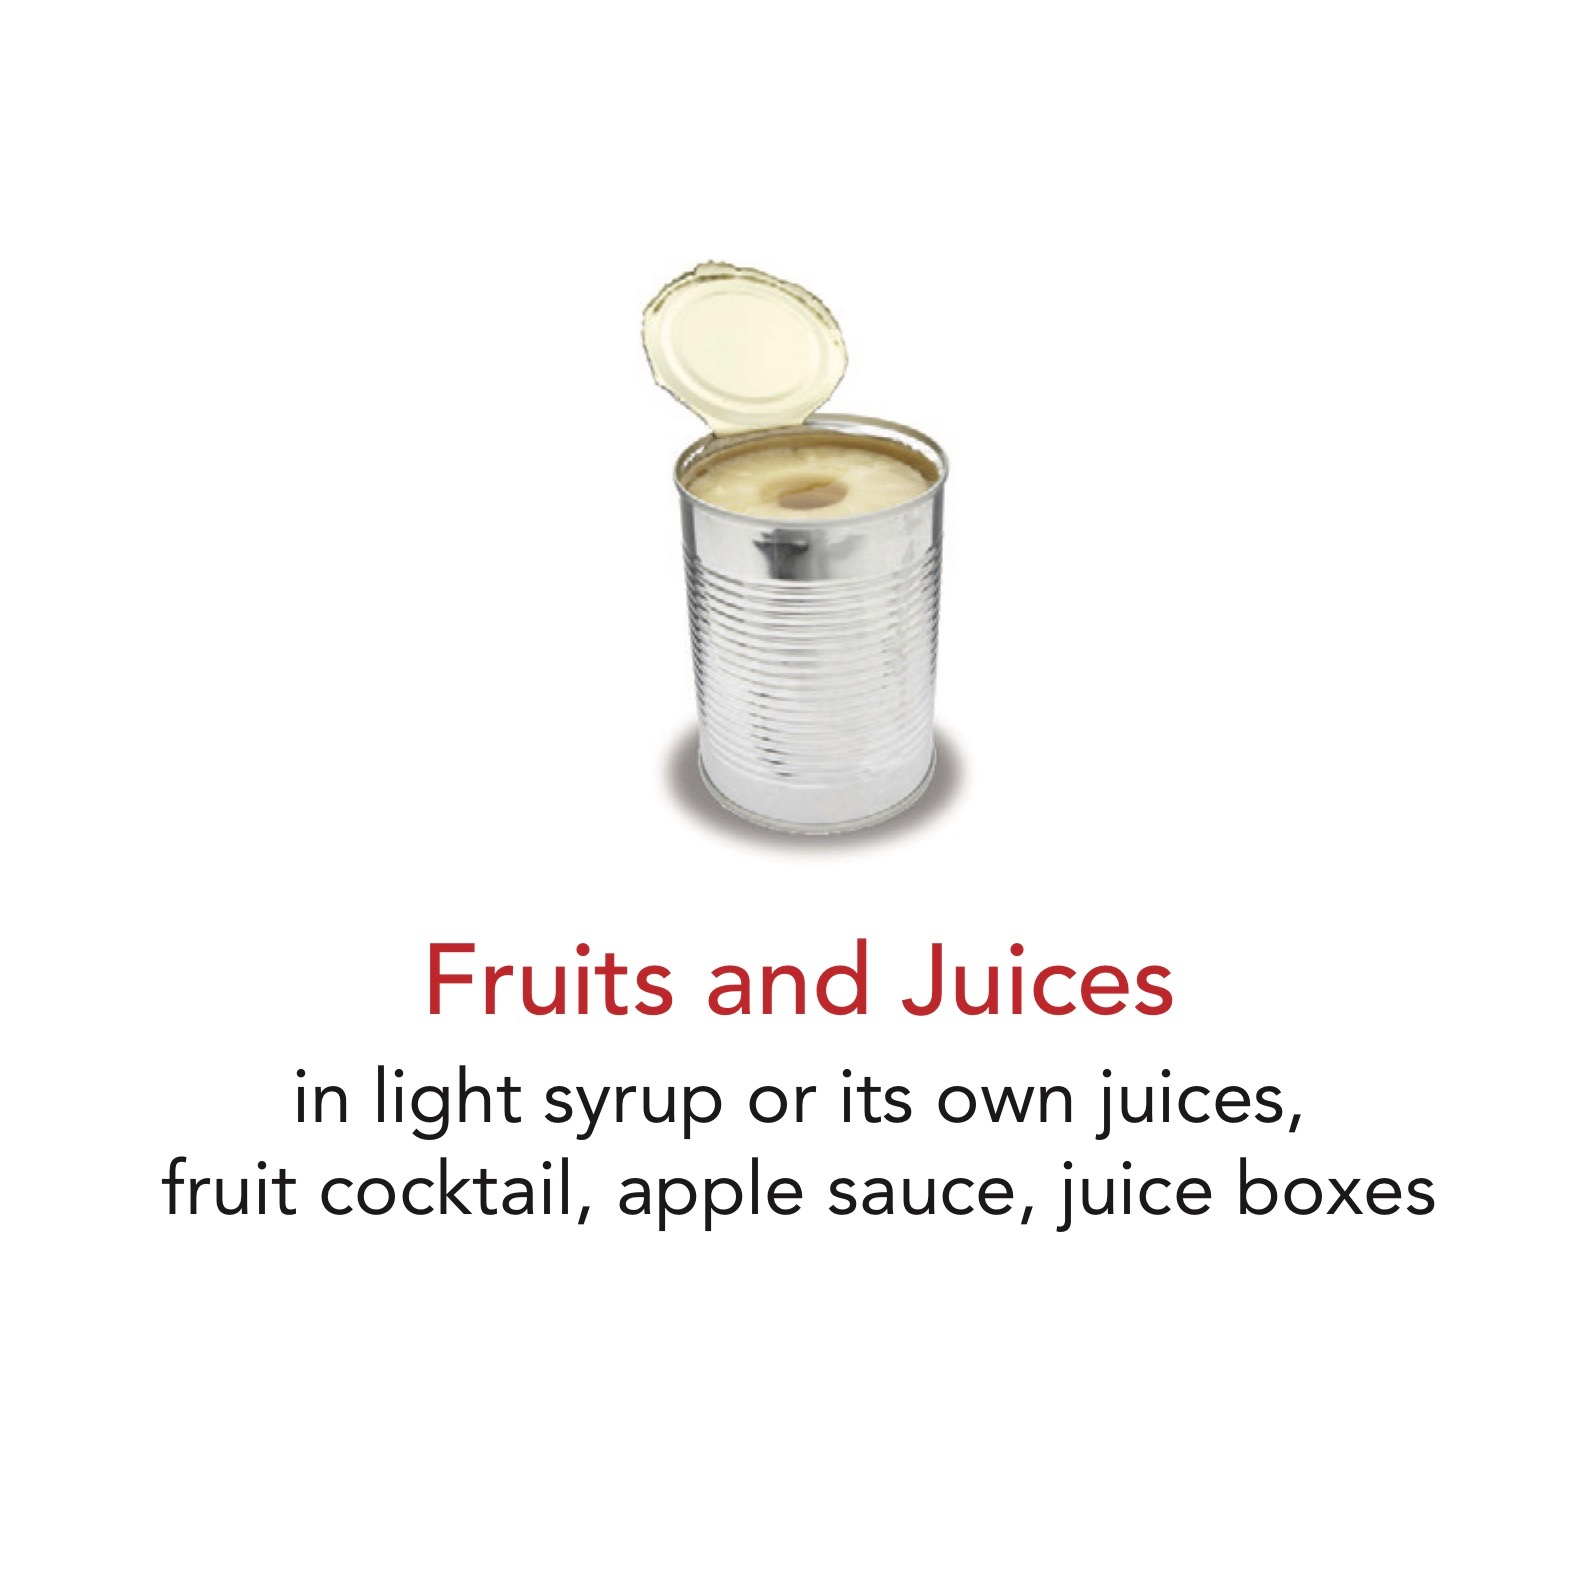 FruitsJuices.jpeg